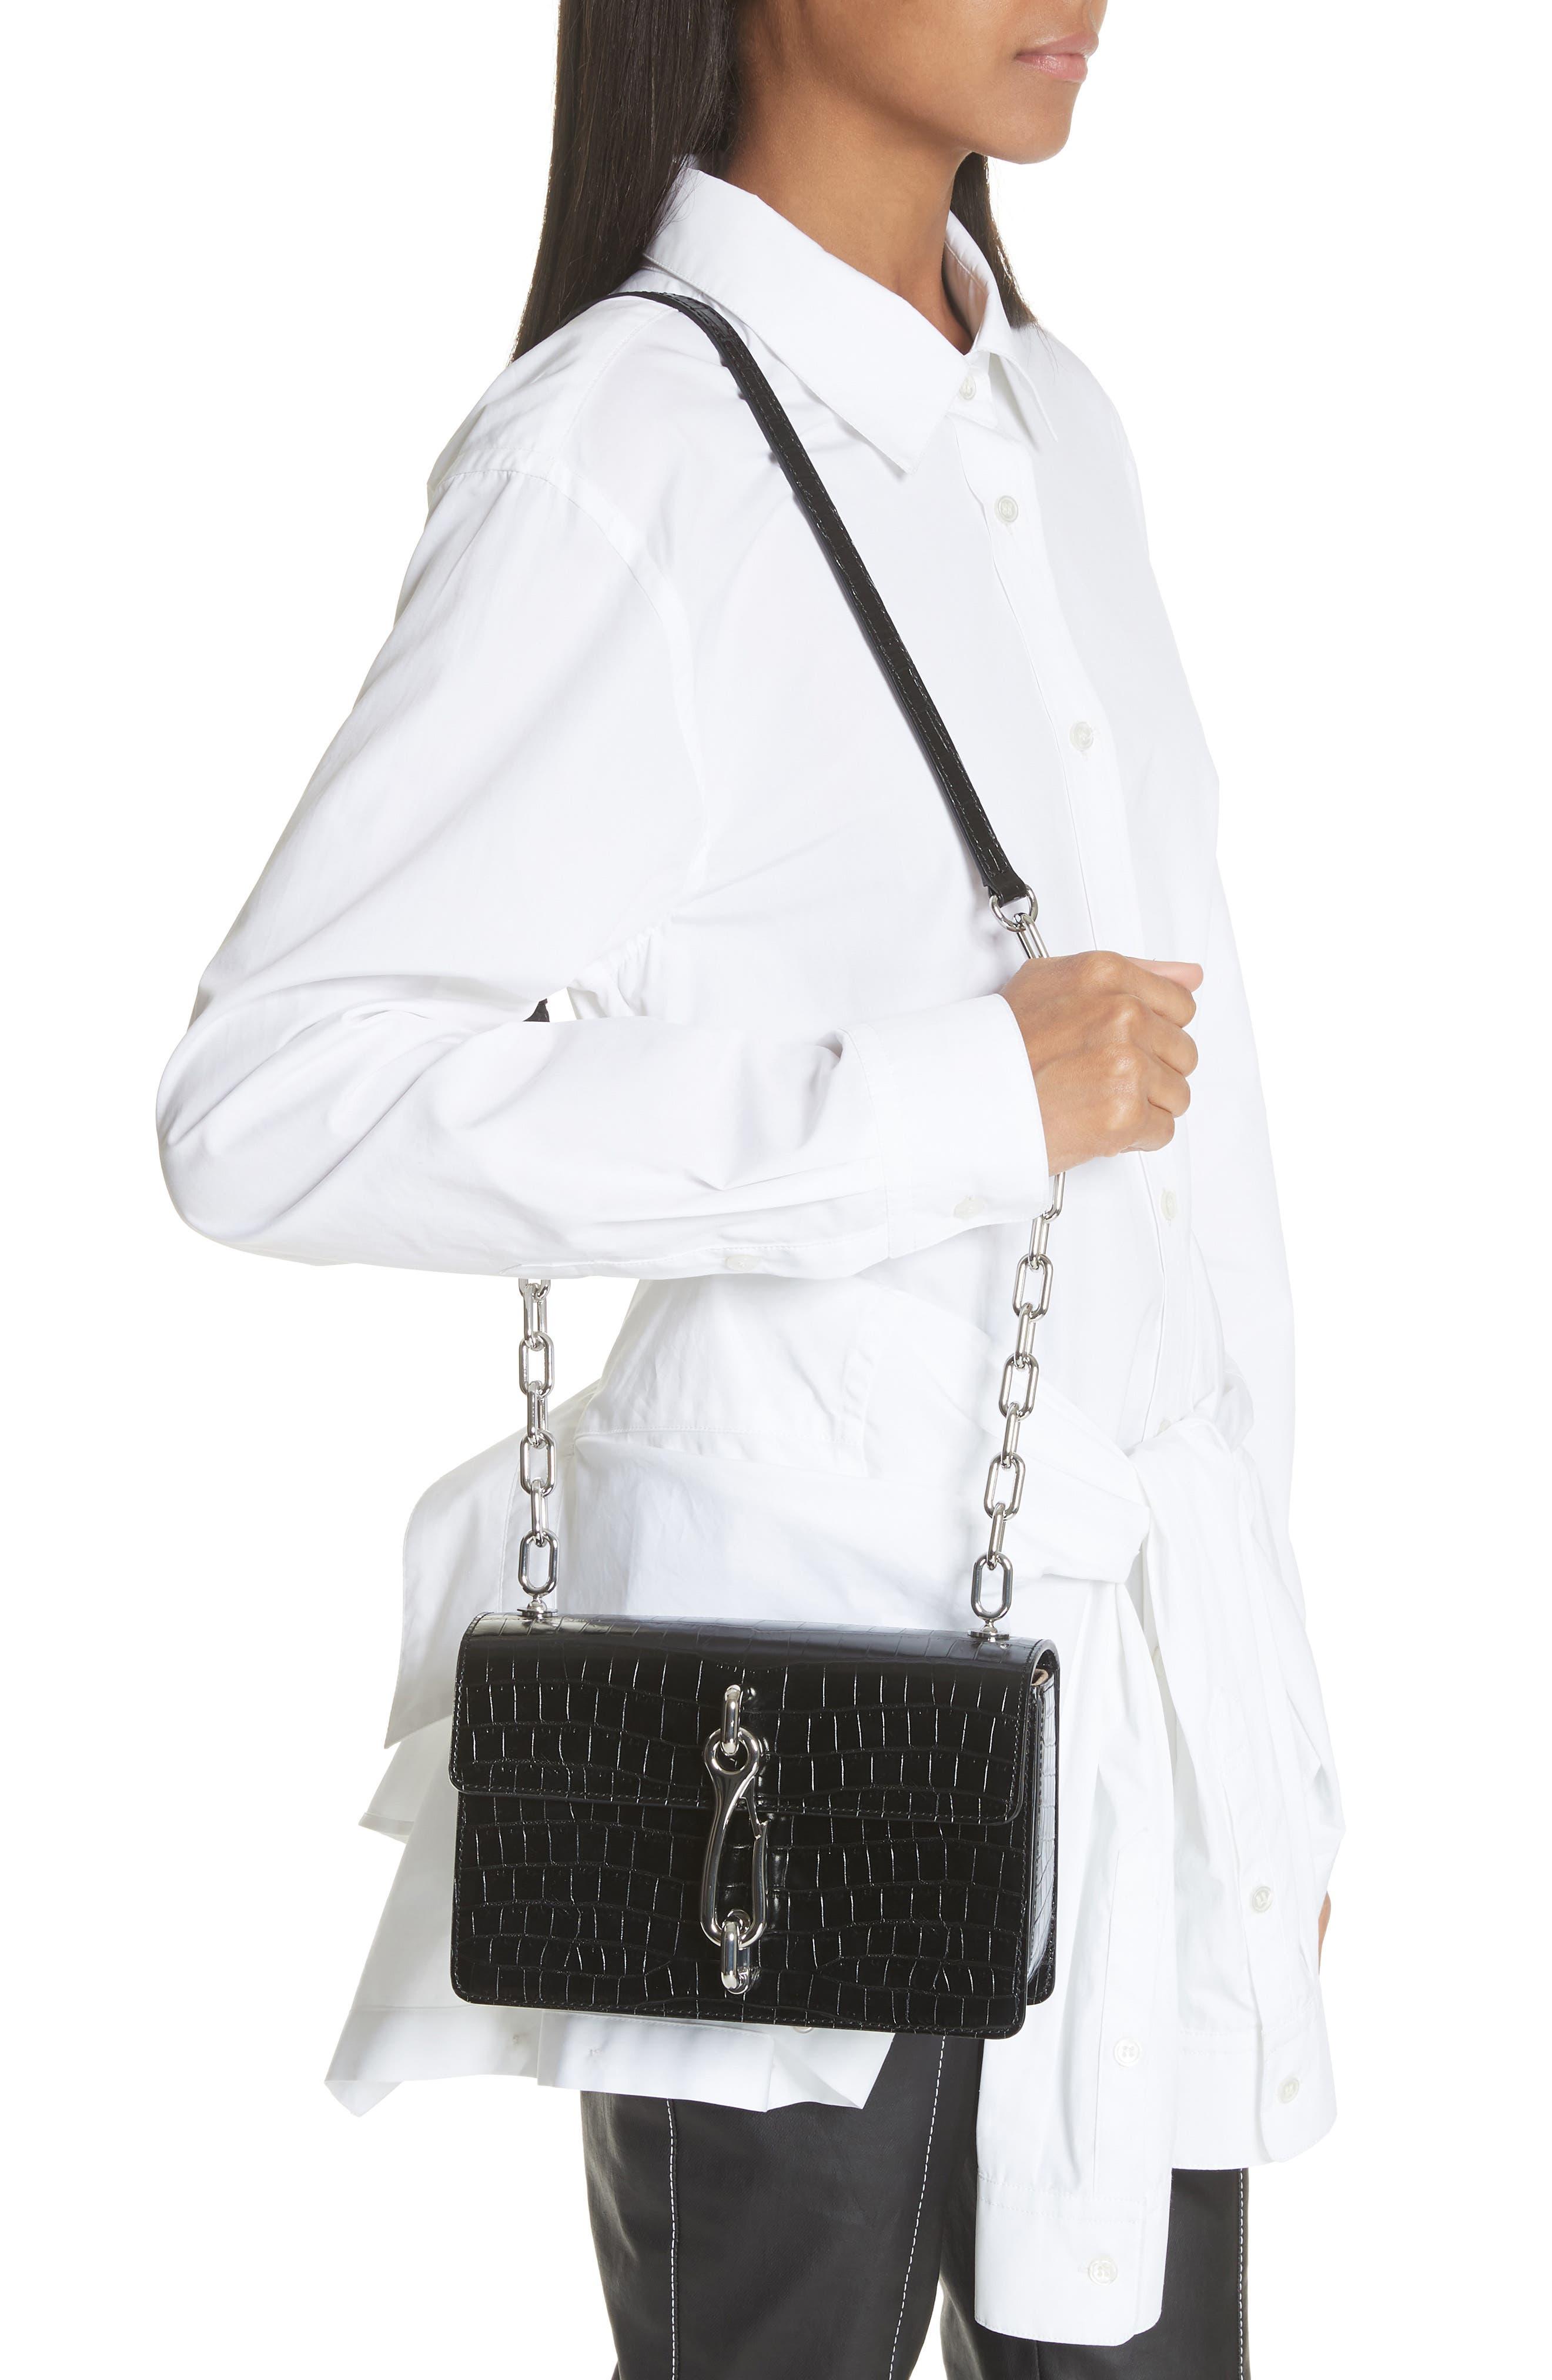 Hook Medium Leather Shoulder/Crossbody Bag,                             Alternate thumbnail 2, color,                             001